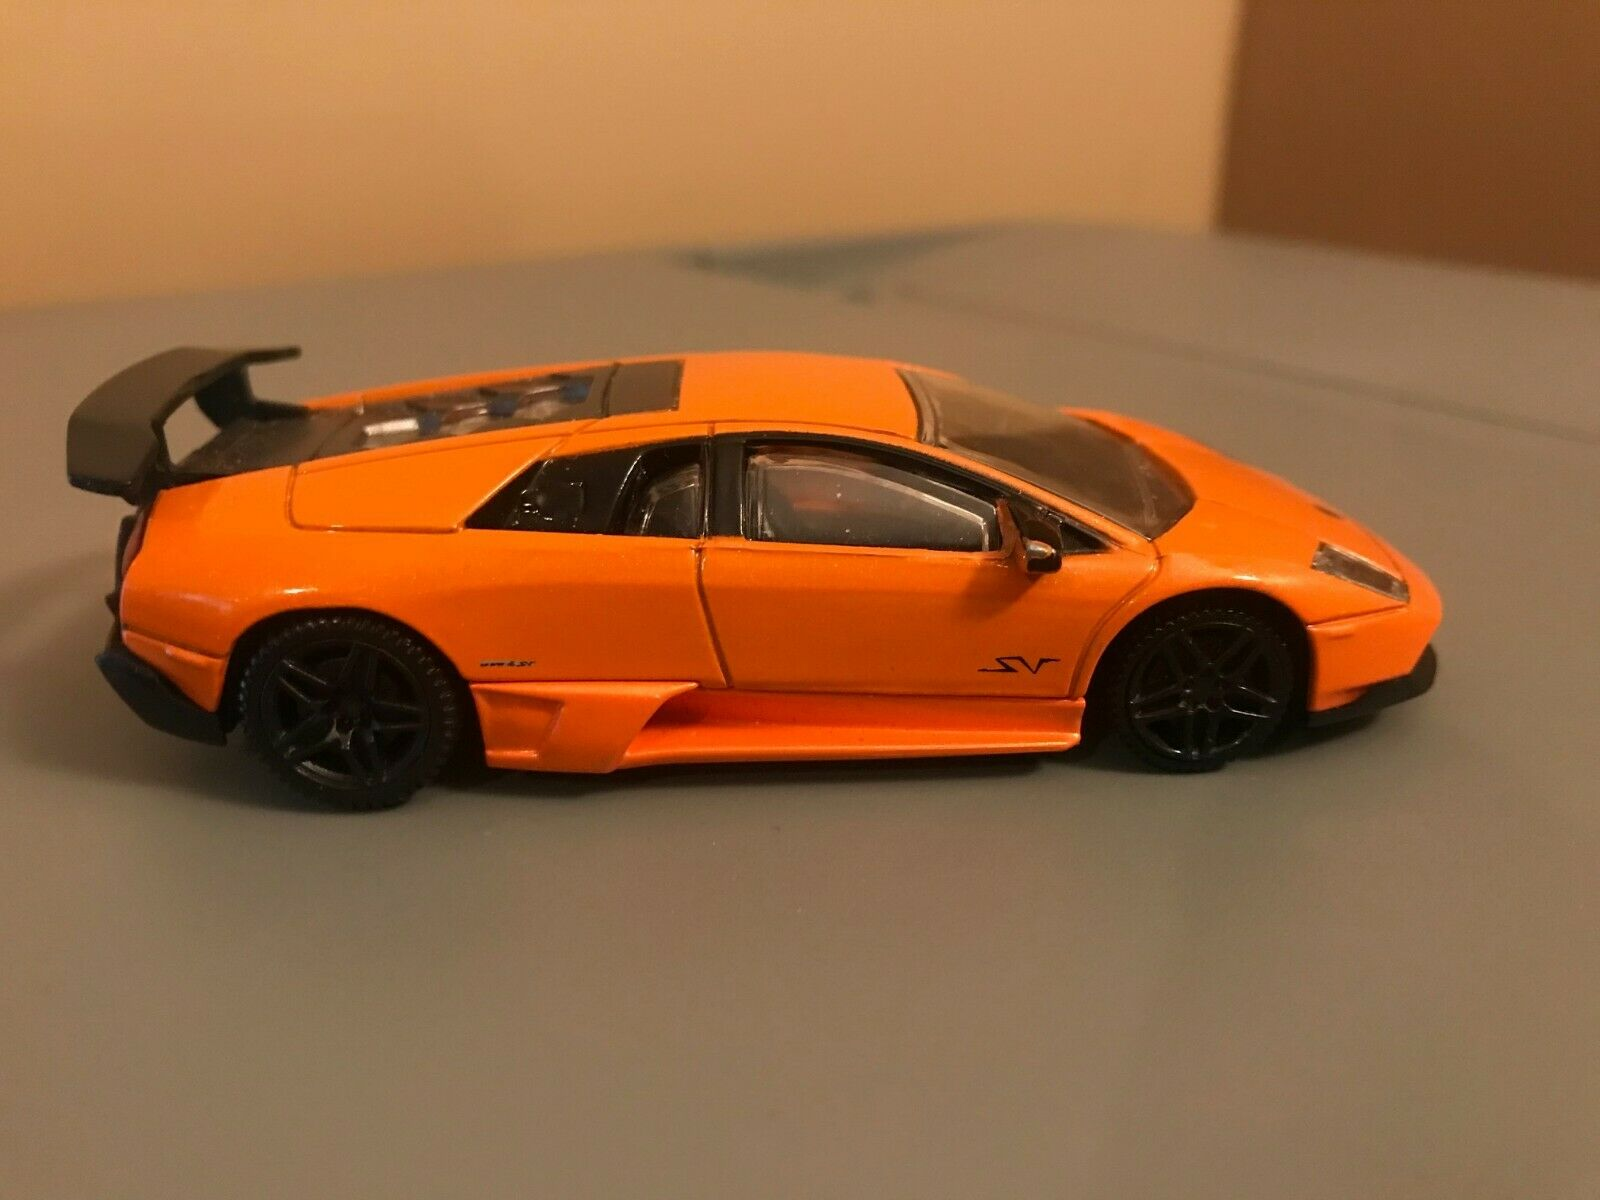 Lamborghini Murcielago Lp670 4 Sv Arancio Atlas Orange 1 43 By Autoart 54627 For Sale Online Ebay